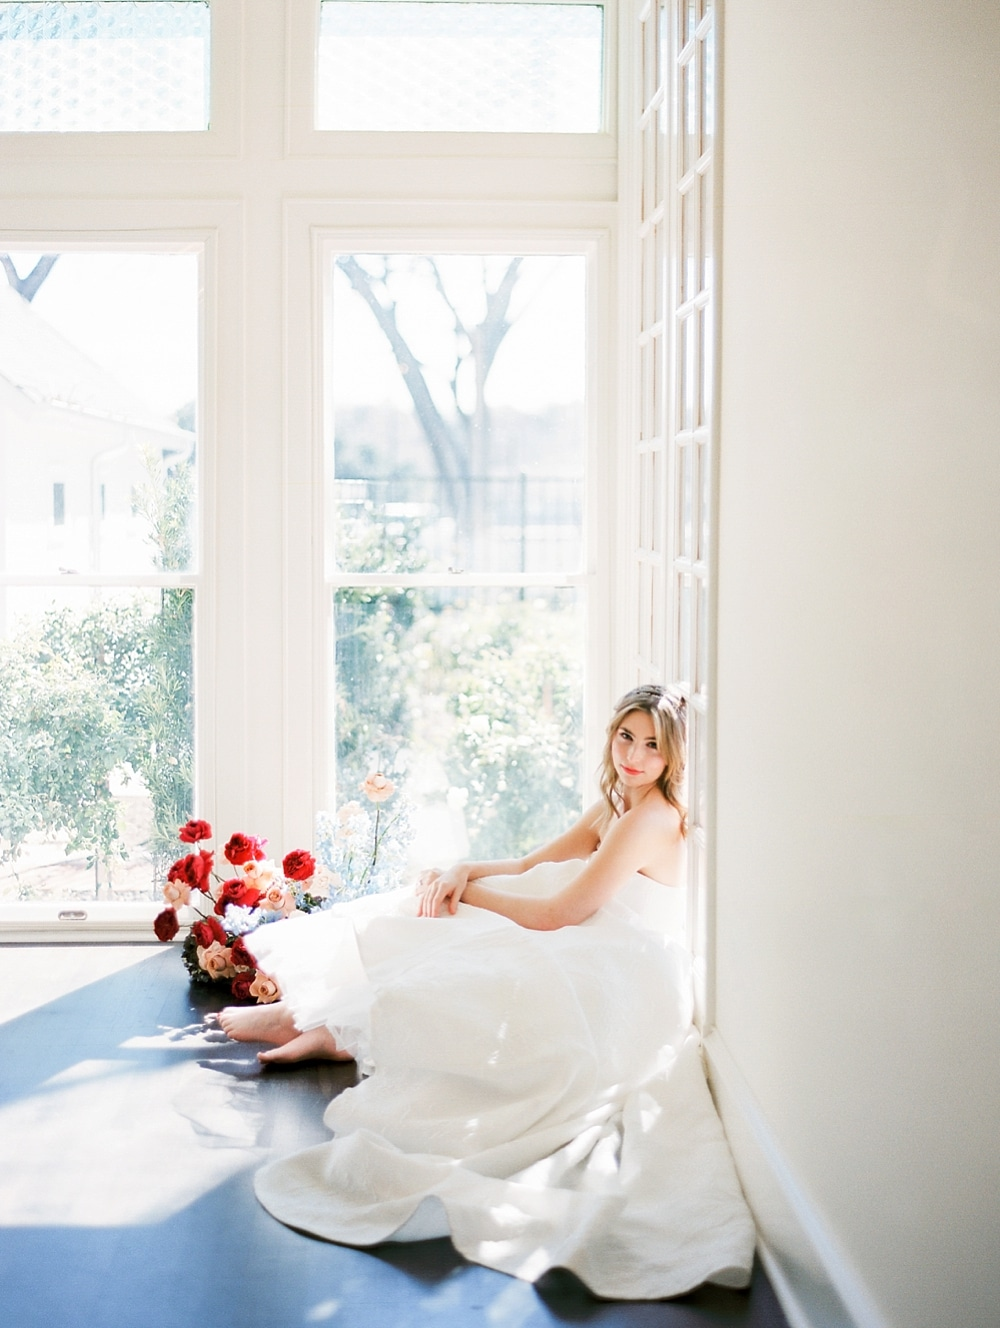 kristin-la-voie-photography-austin-wedding-photographer-woodbine-mansion-20